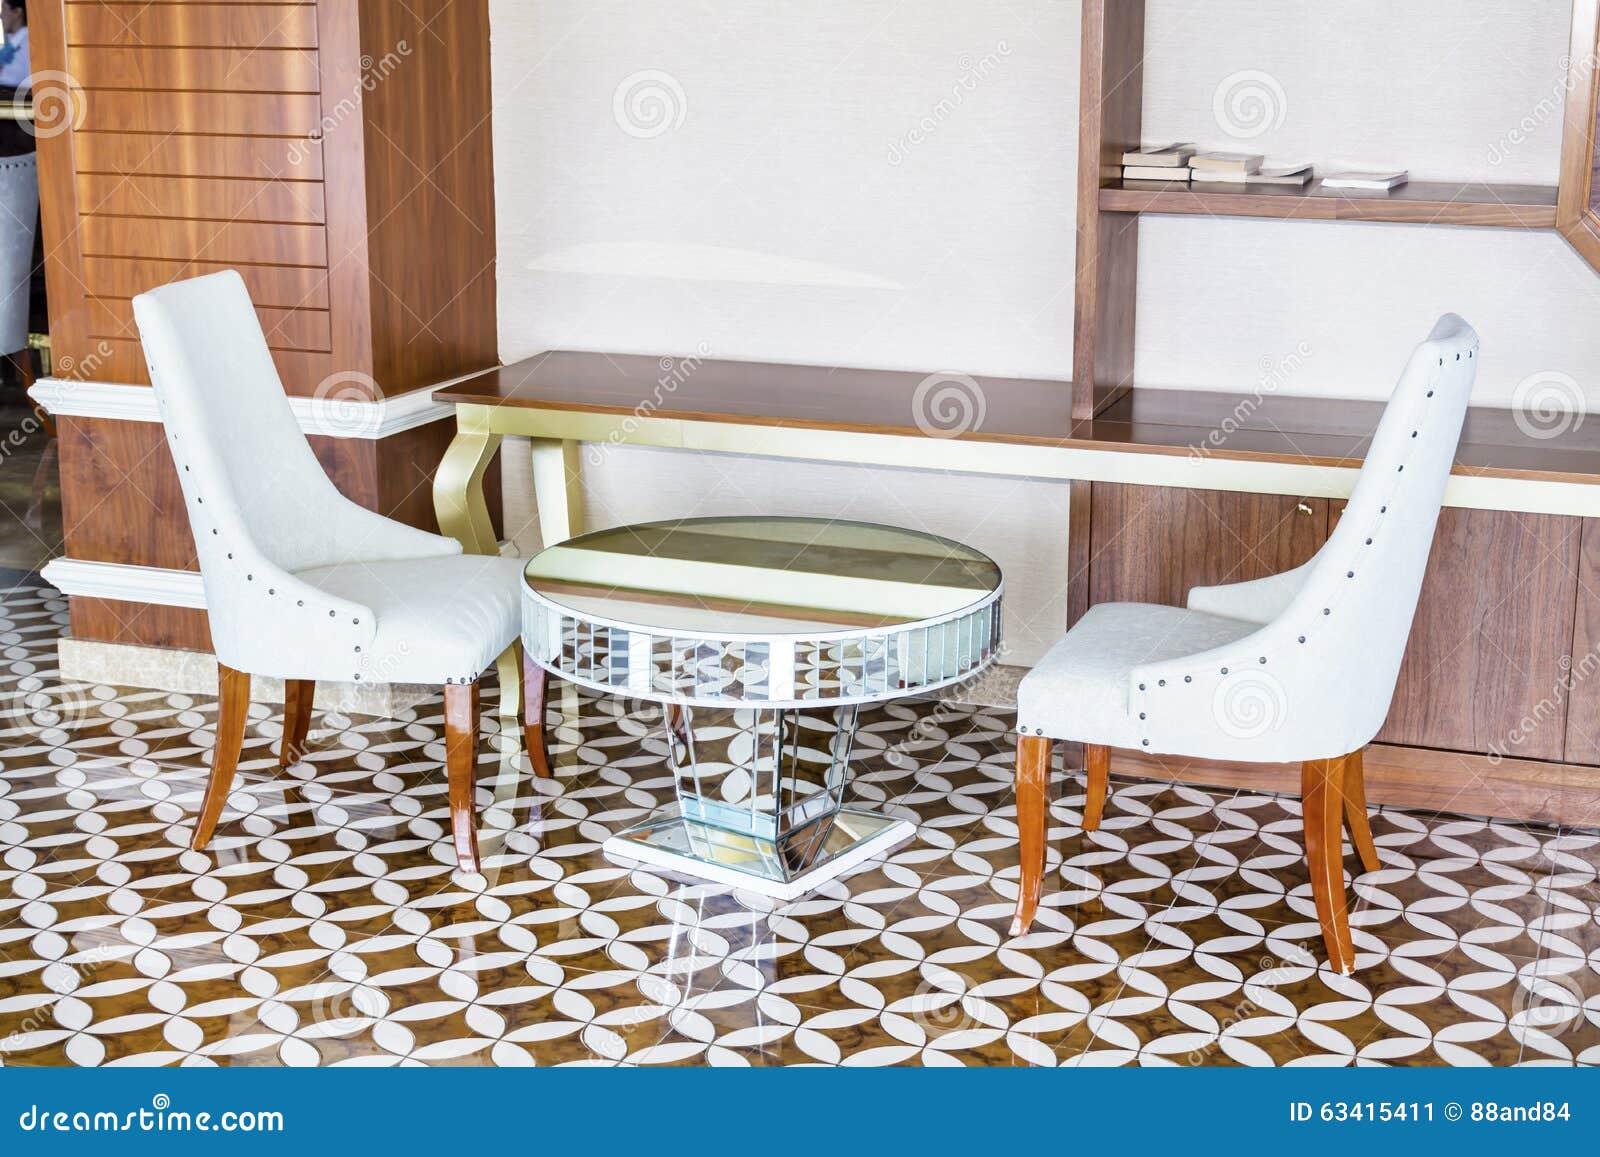 Hotel lobby furniture - Royalty Free Stock Photo